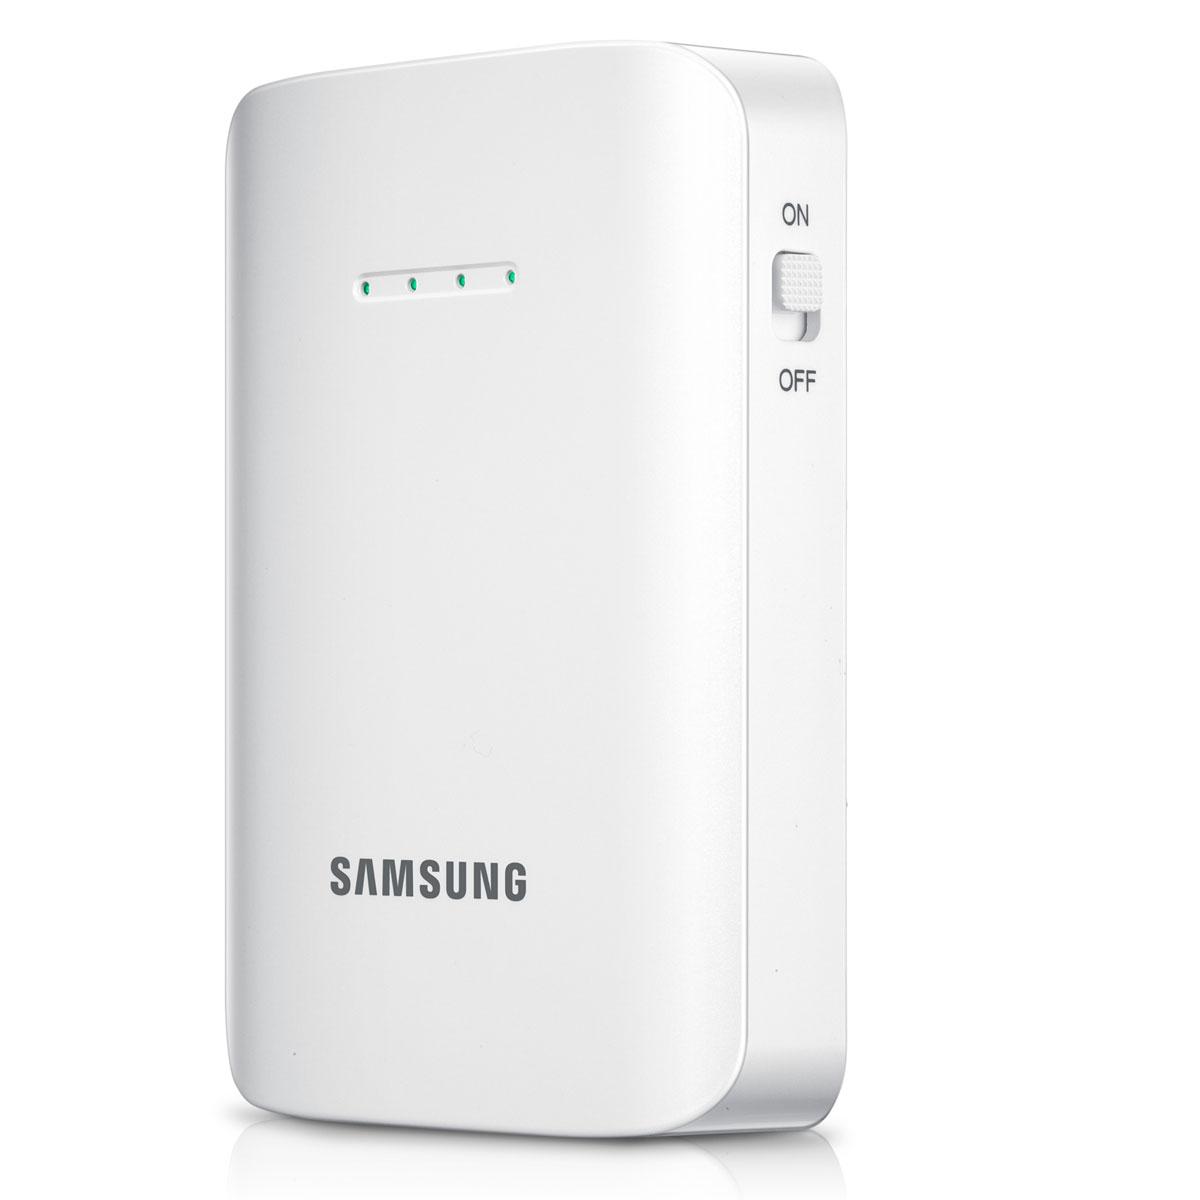 Samsung EEB-EI1CWE - Batterie téléphone Samsung sur LDLC.com